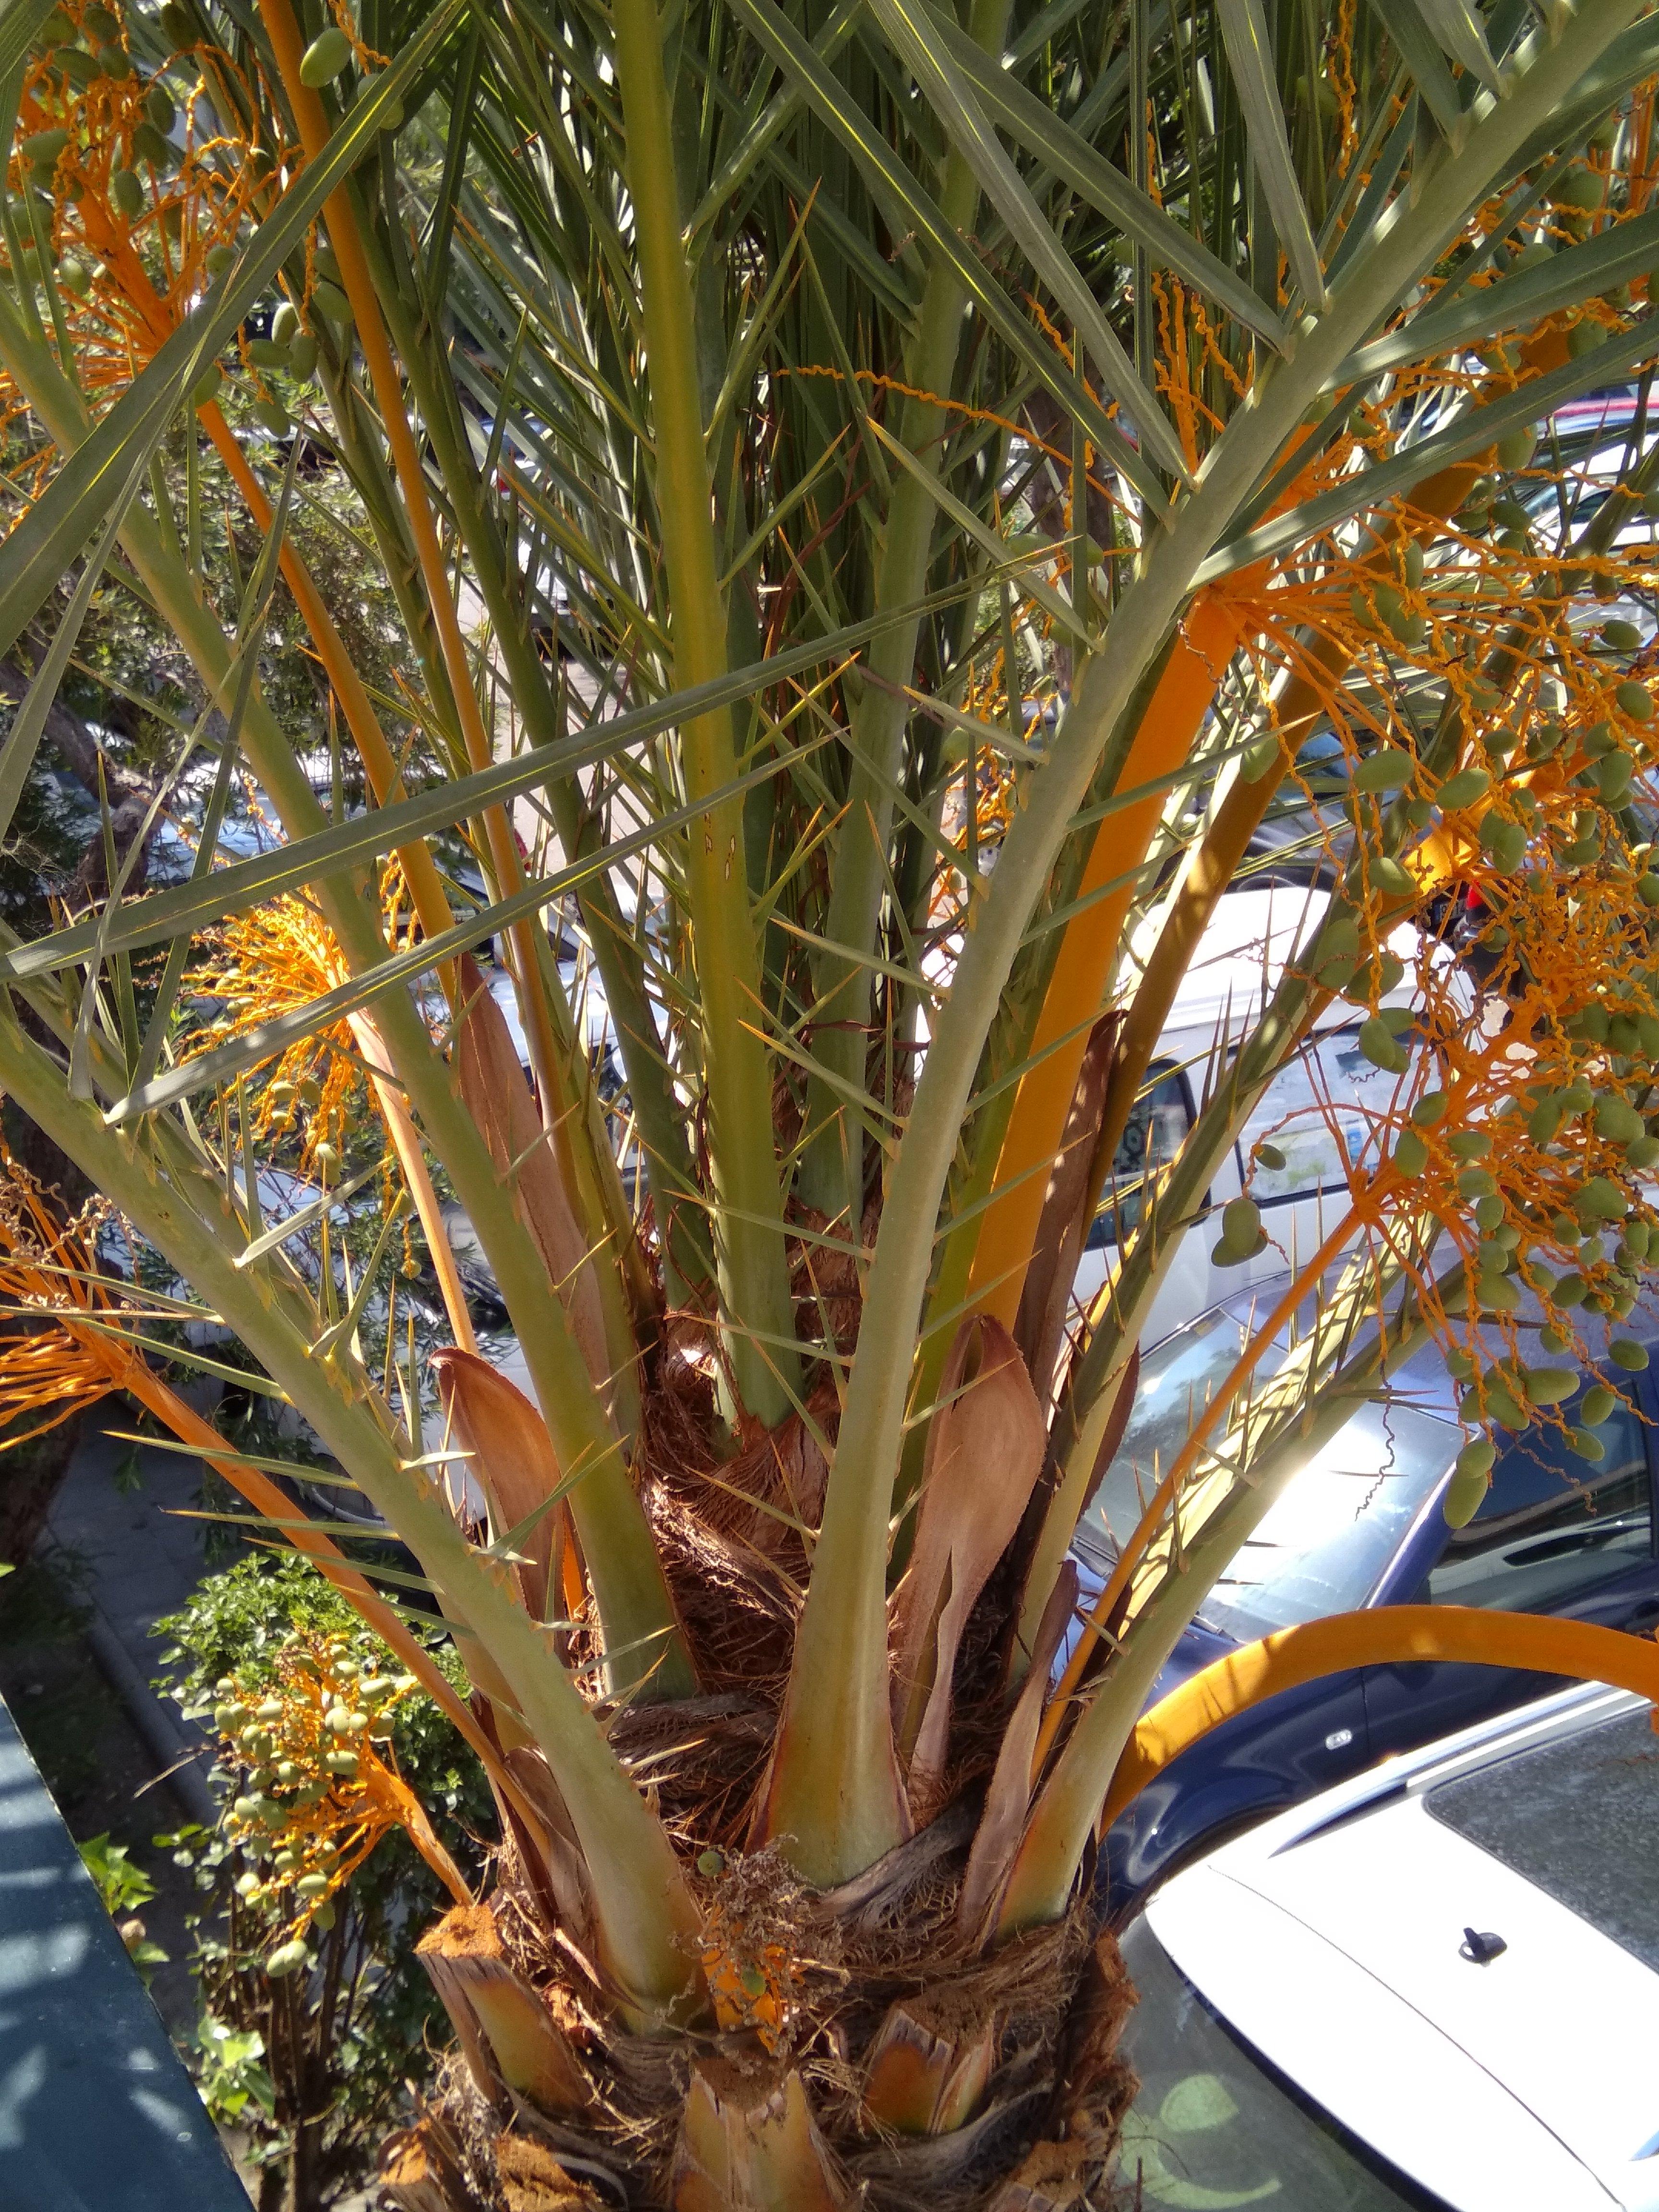 File:Palm tree.jpg - Wikimedia Commons